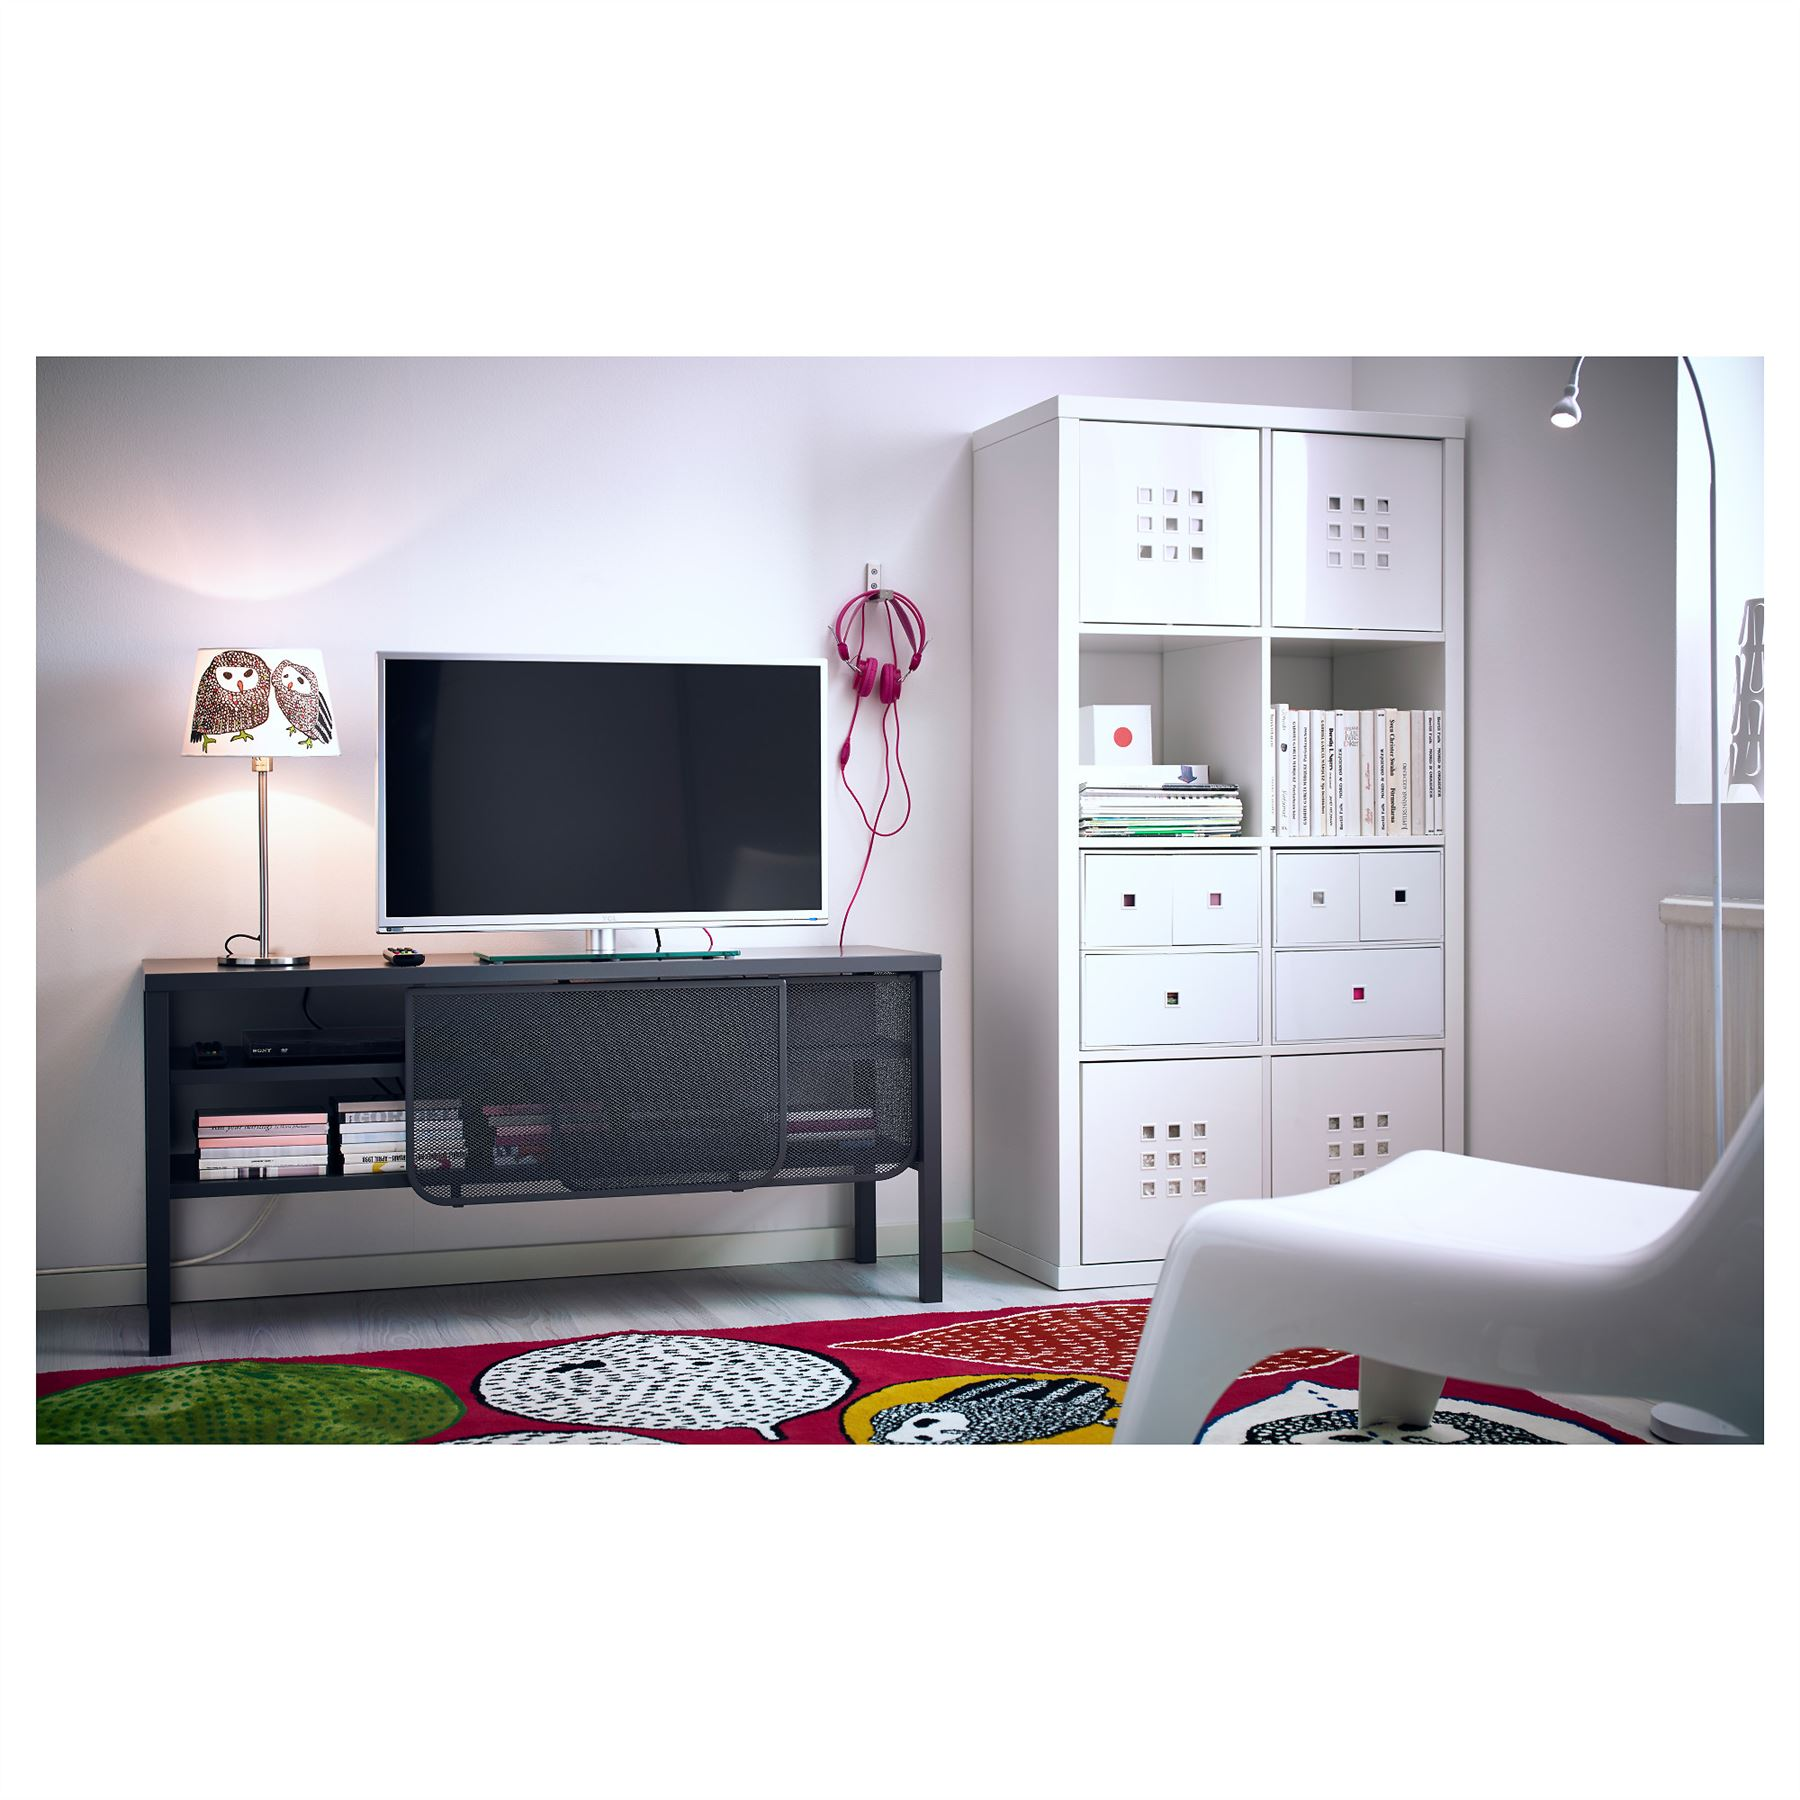 ikea kallax 8 cube storage bookcase rectangle shelving unit white ebay. Black Bedroom Furniture Sets. Home Design Ideas